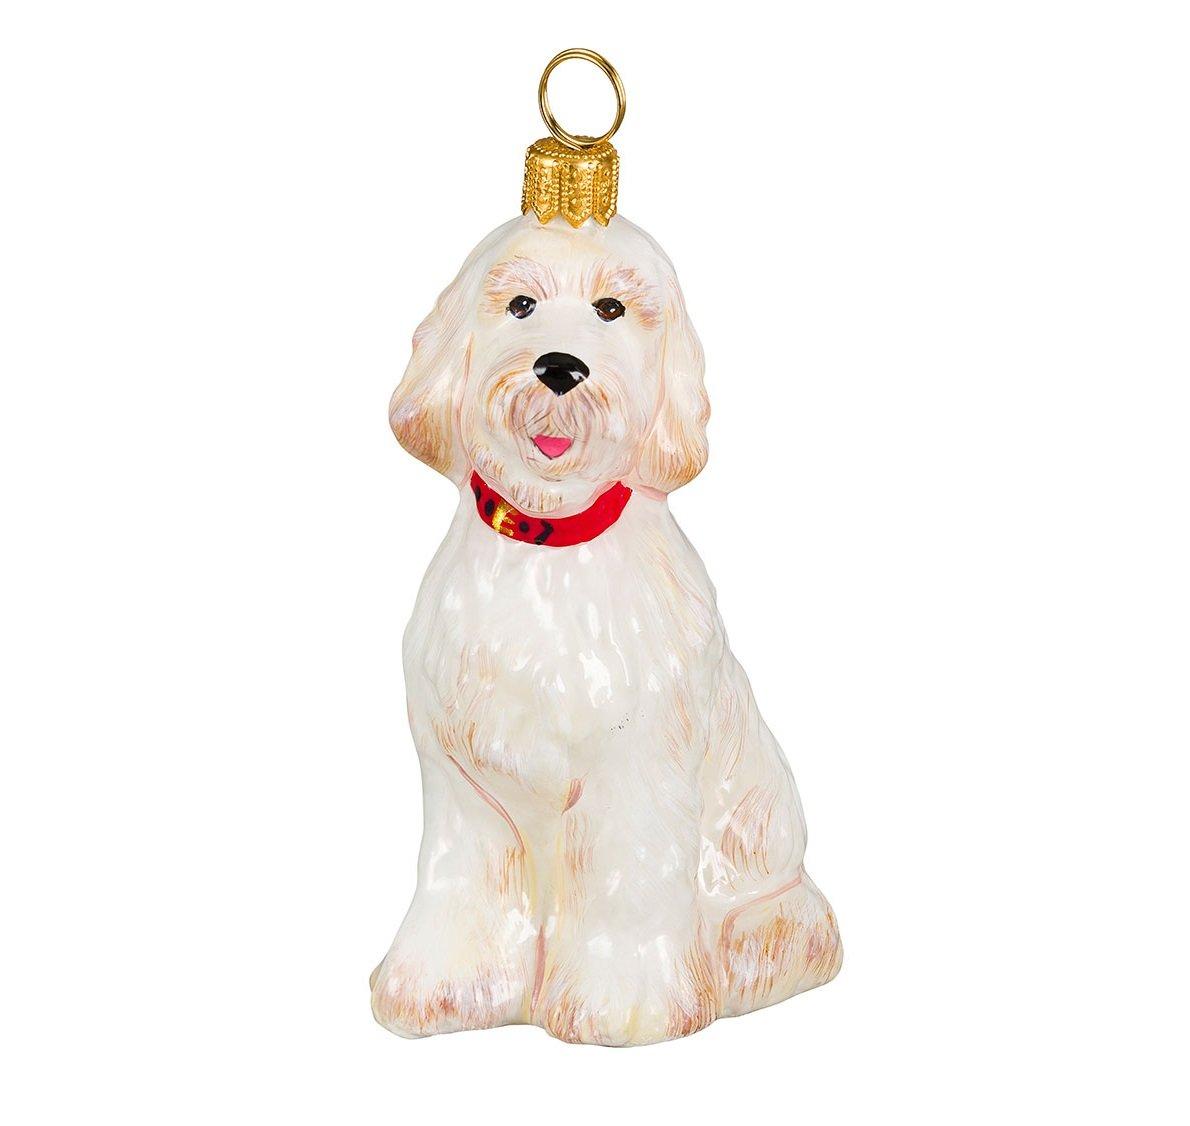 Joy-To-The-World-White-Goldendoodle-Sitting-Dog-Polish-Blown-Glass-Christmas-Ornament